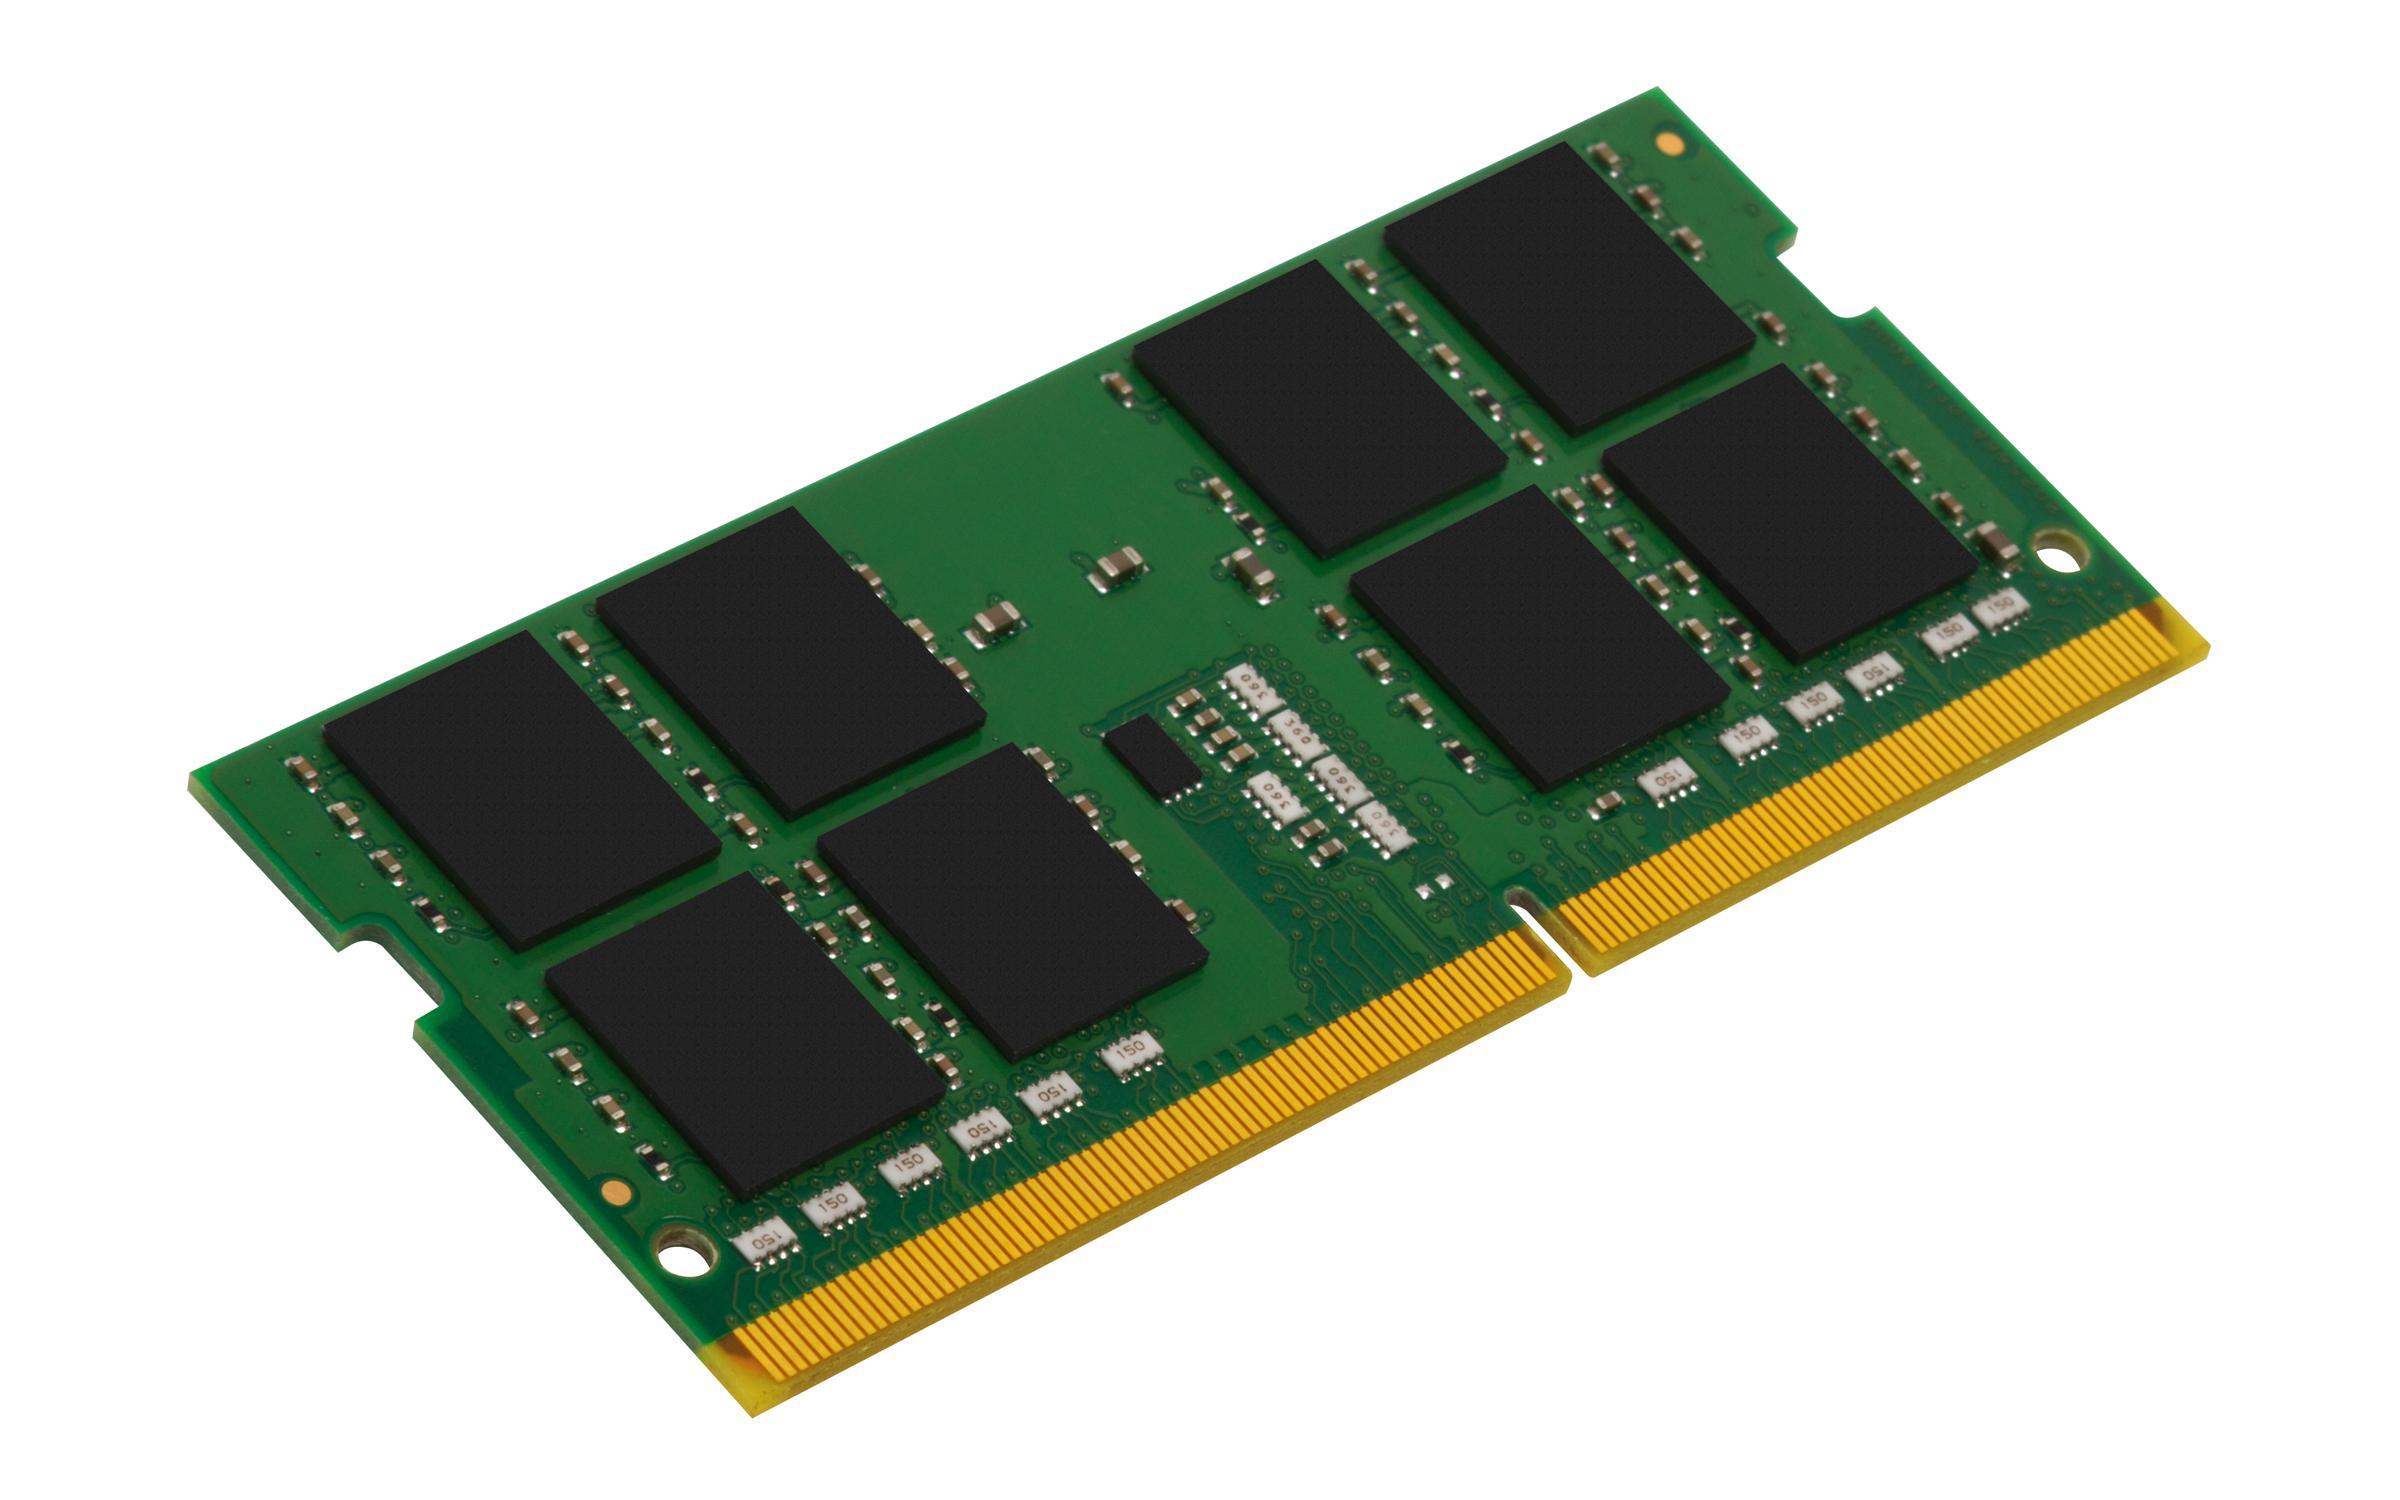 Памет Kingston 8GB, SODIMM, DDR4, PC4-25600, 3200MHz, CL22 KVR32S22S8/8-2